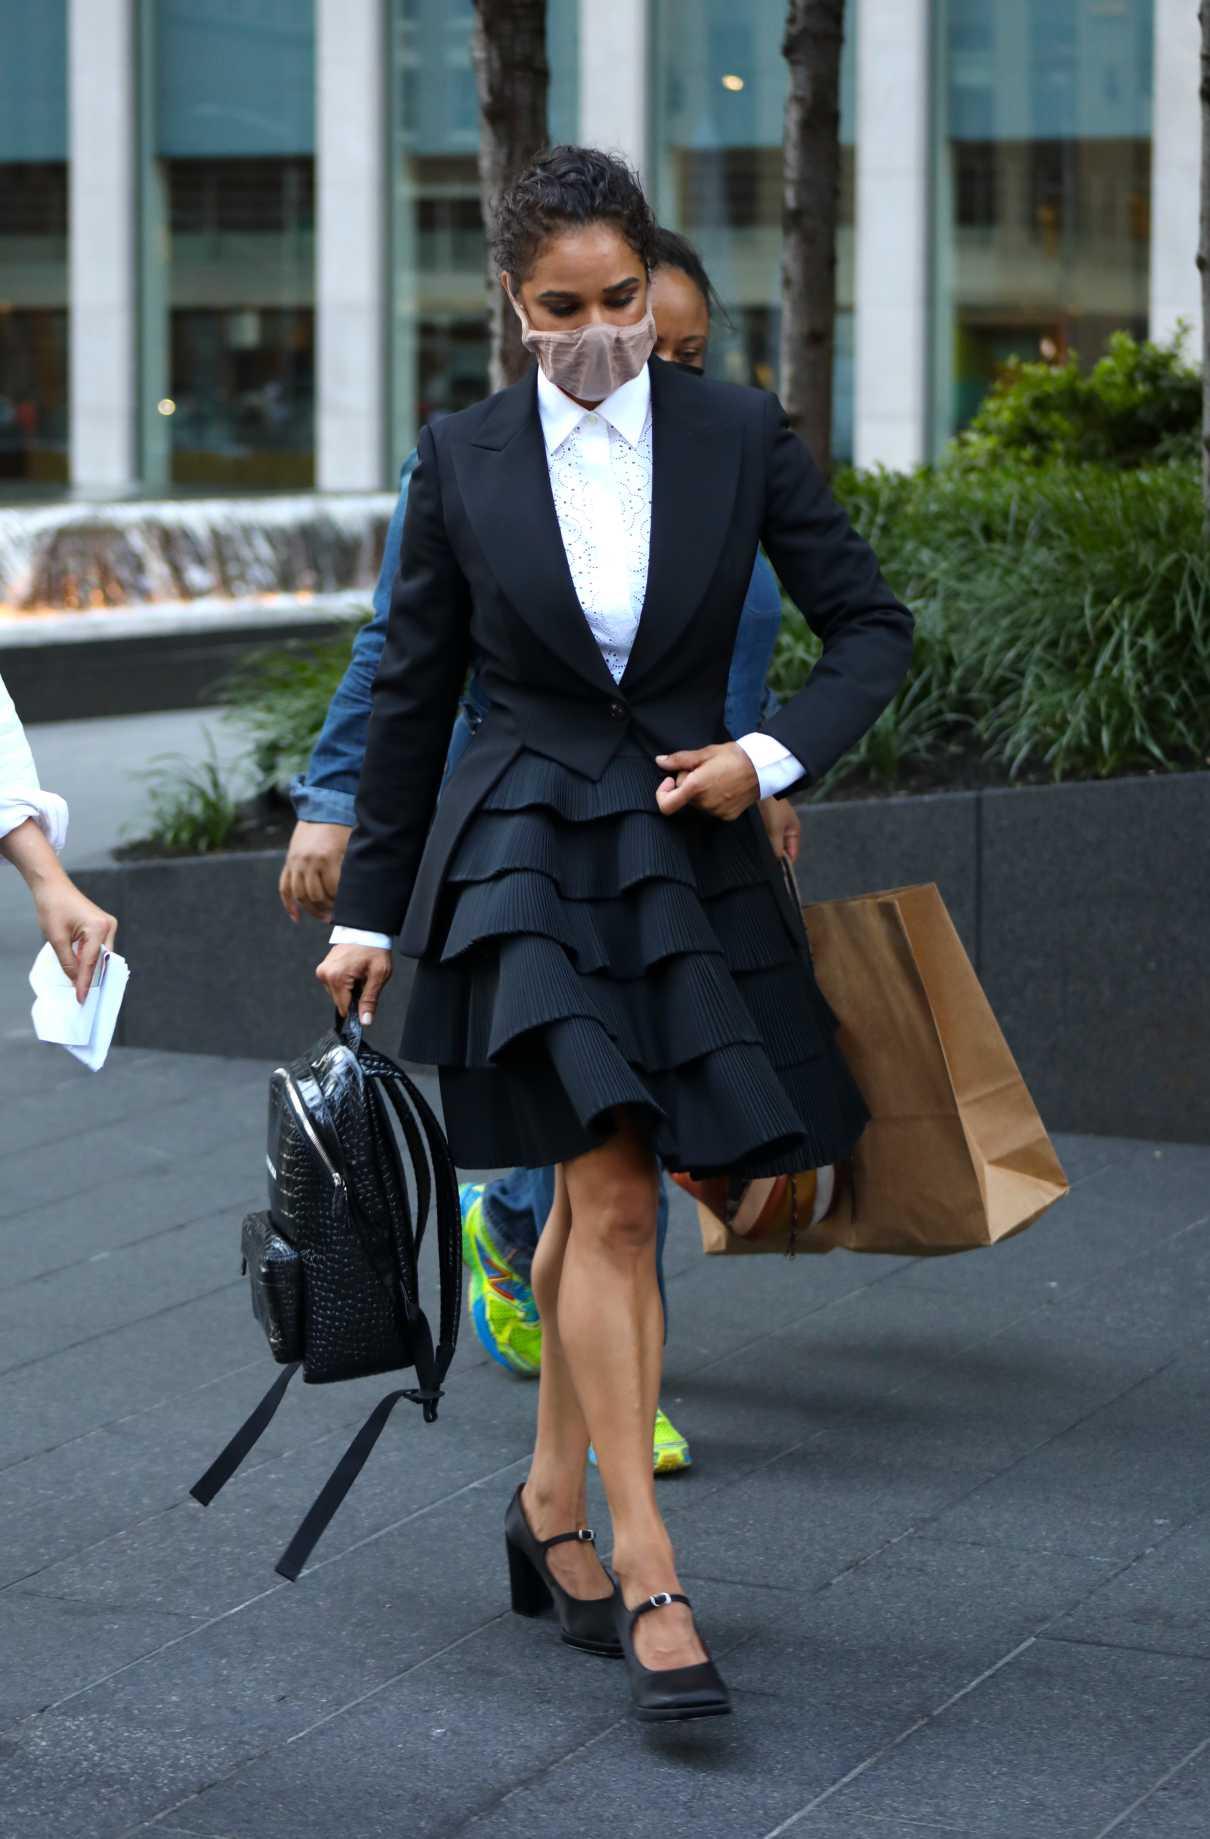 Misty Copeland in a Black Blazer